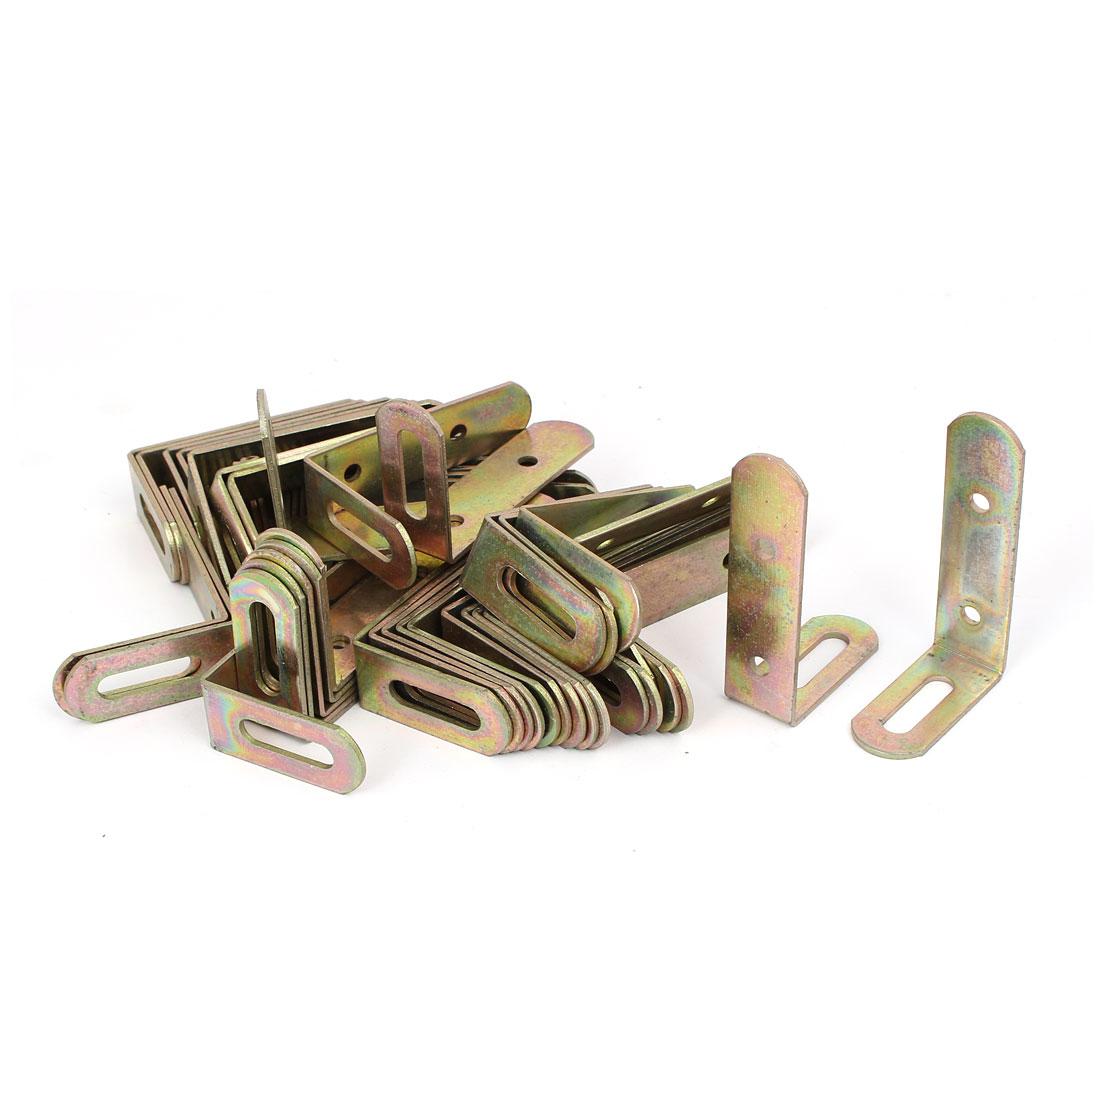 69mmx43mmx19mm L Shape Angle Bracket Corner Brace Fastener Bronze Tone 50pcs